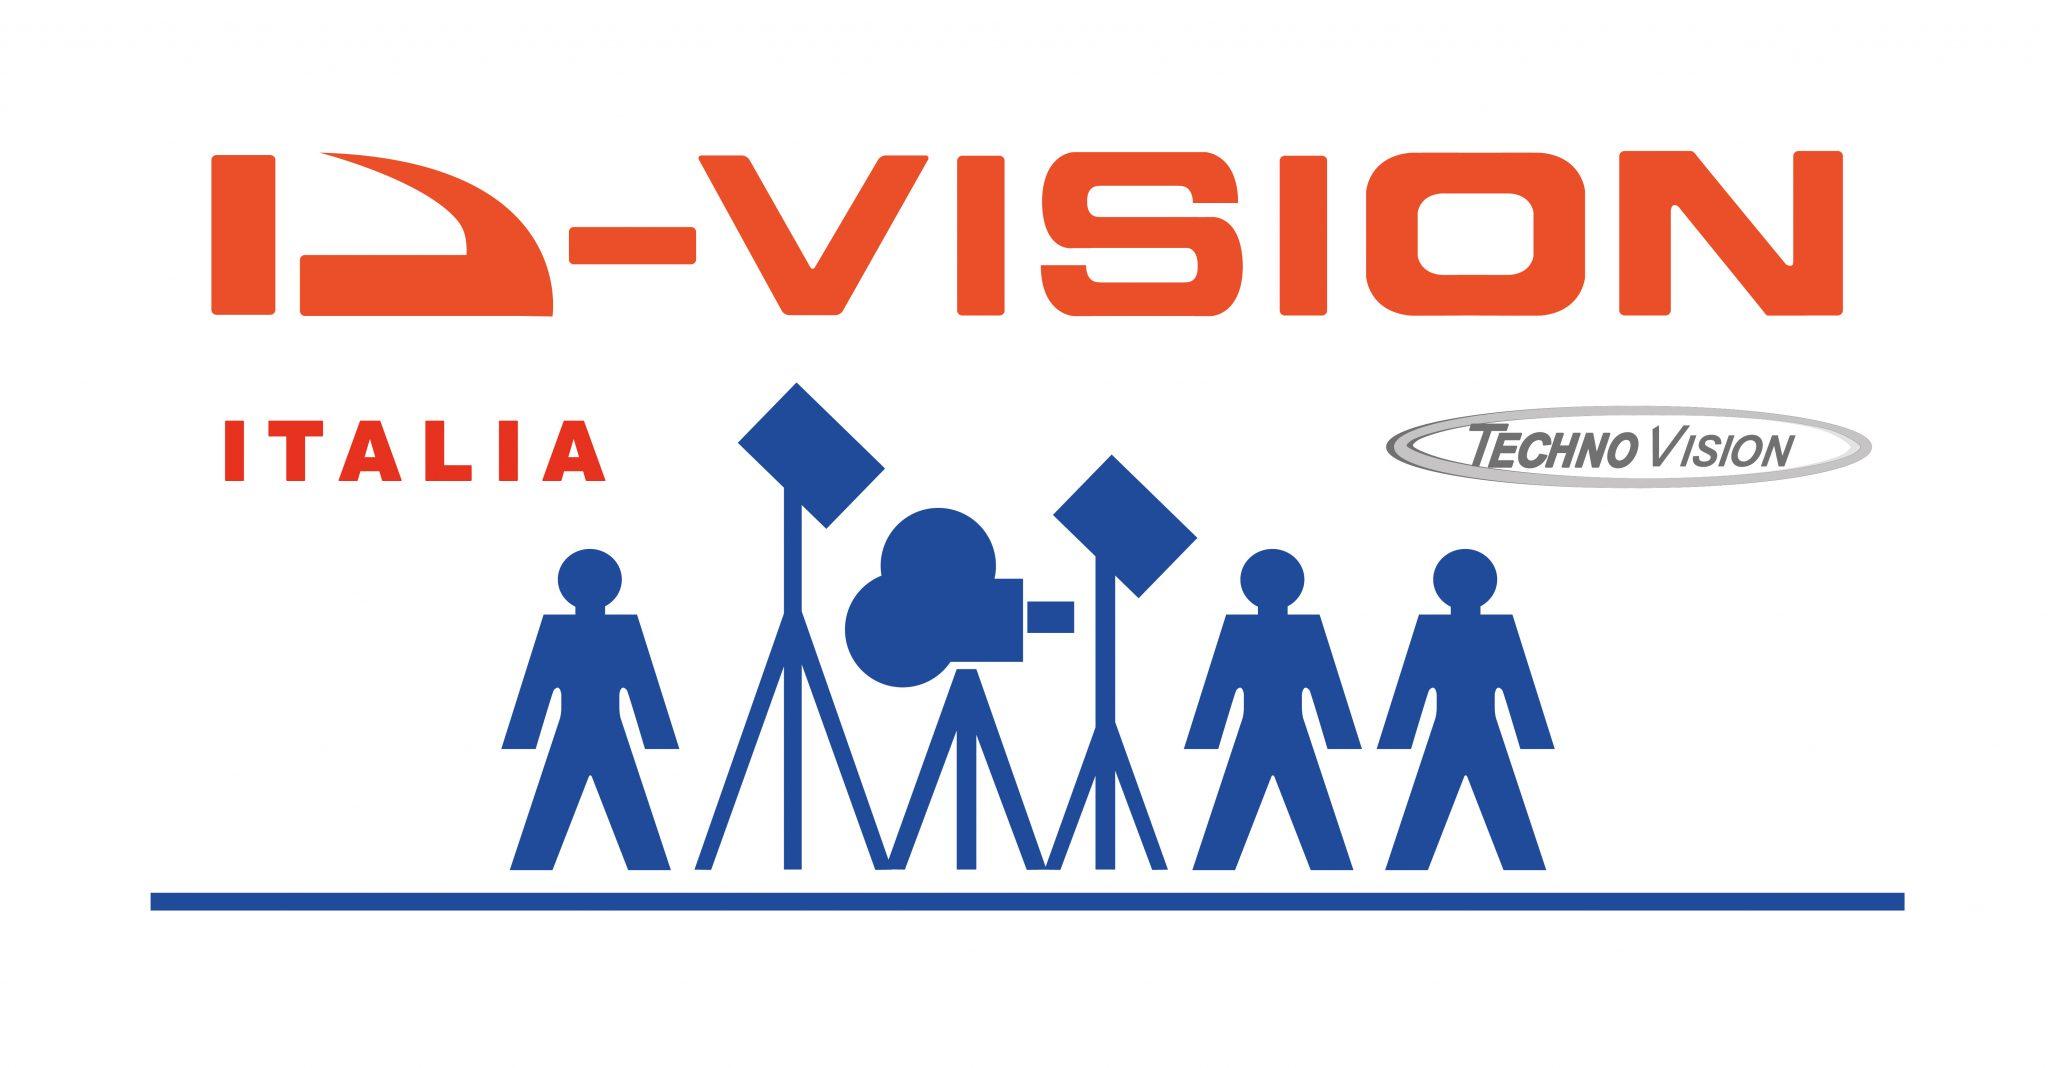 D-vision logo roma creative Contest